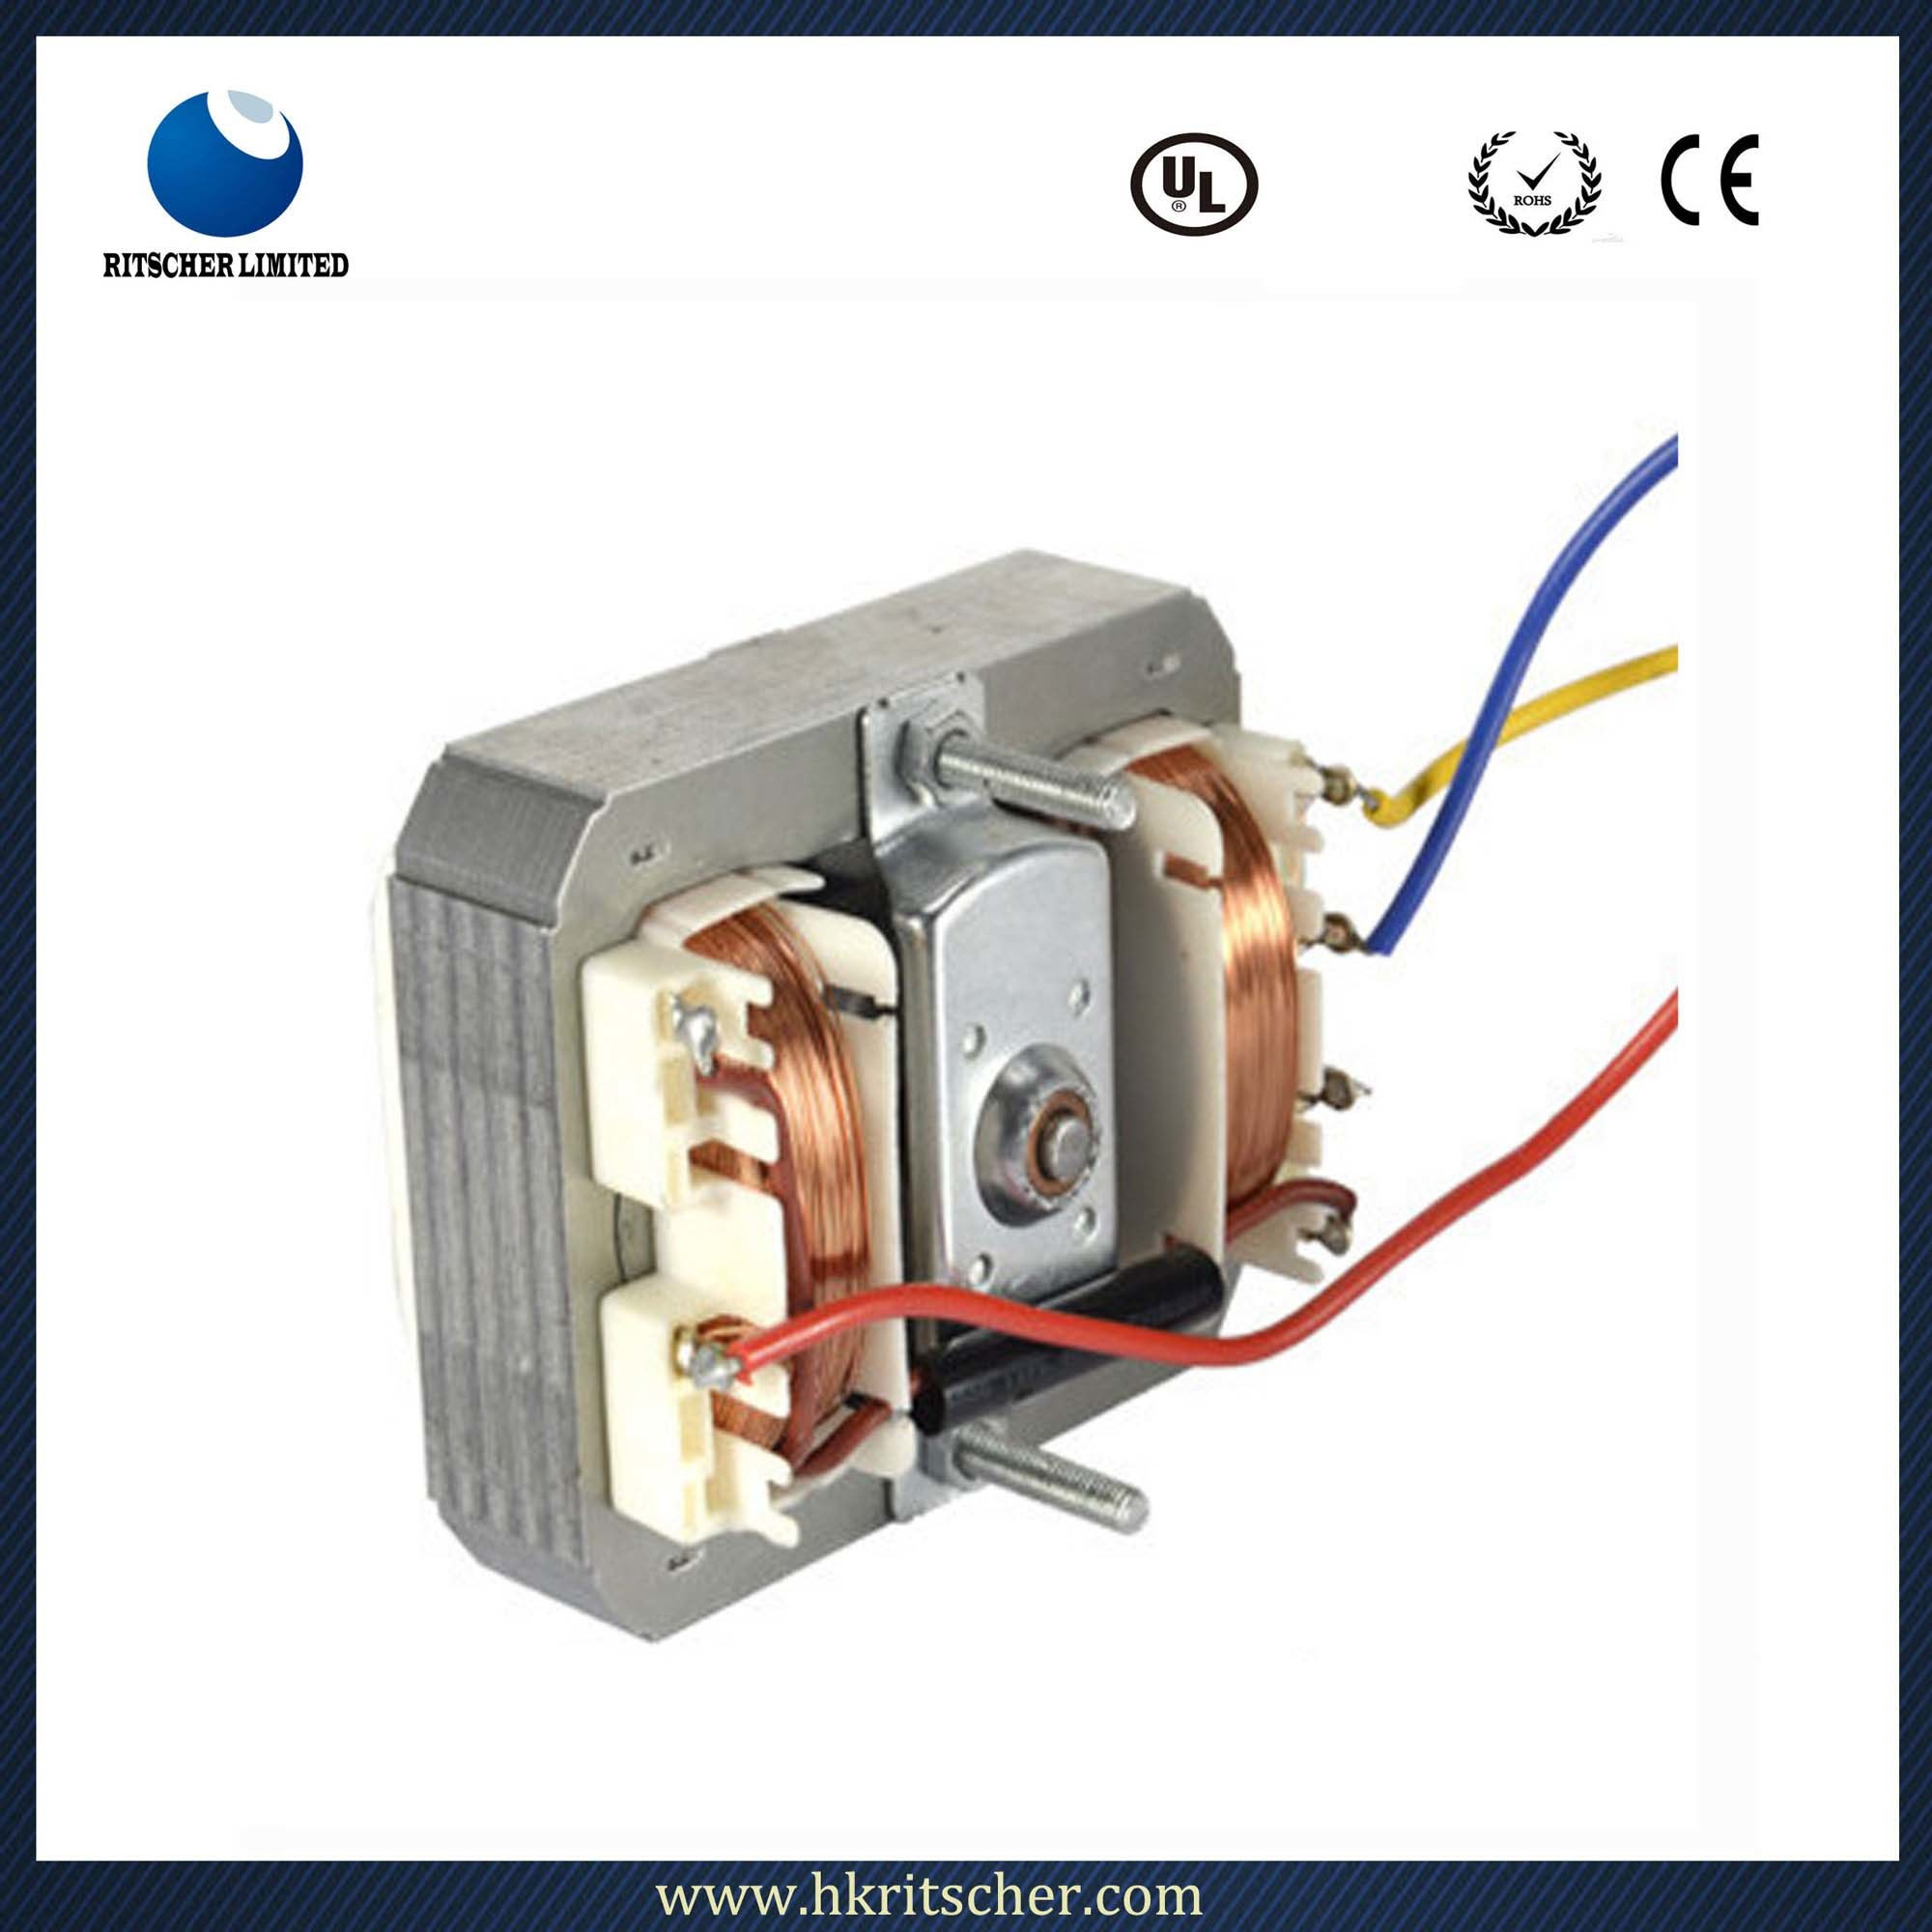 68 Series Induction Motor for Range Hood Fan/Kitchen Application